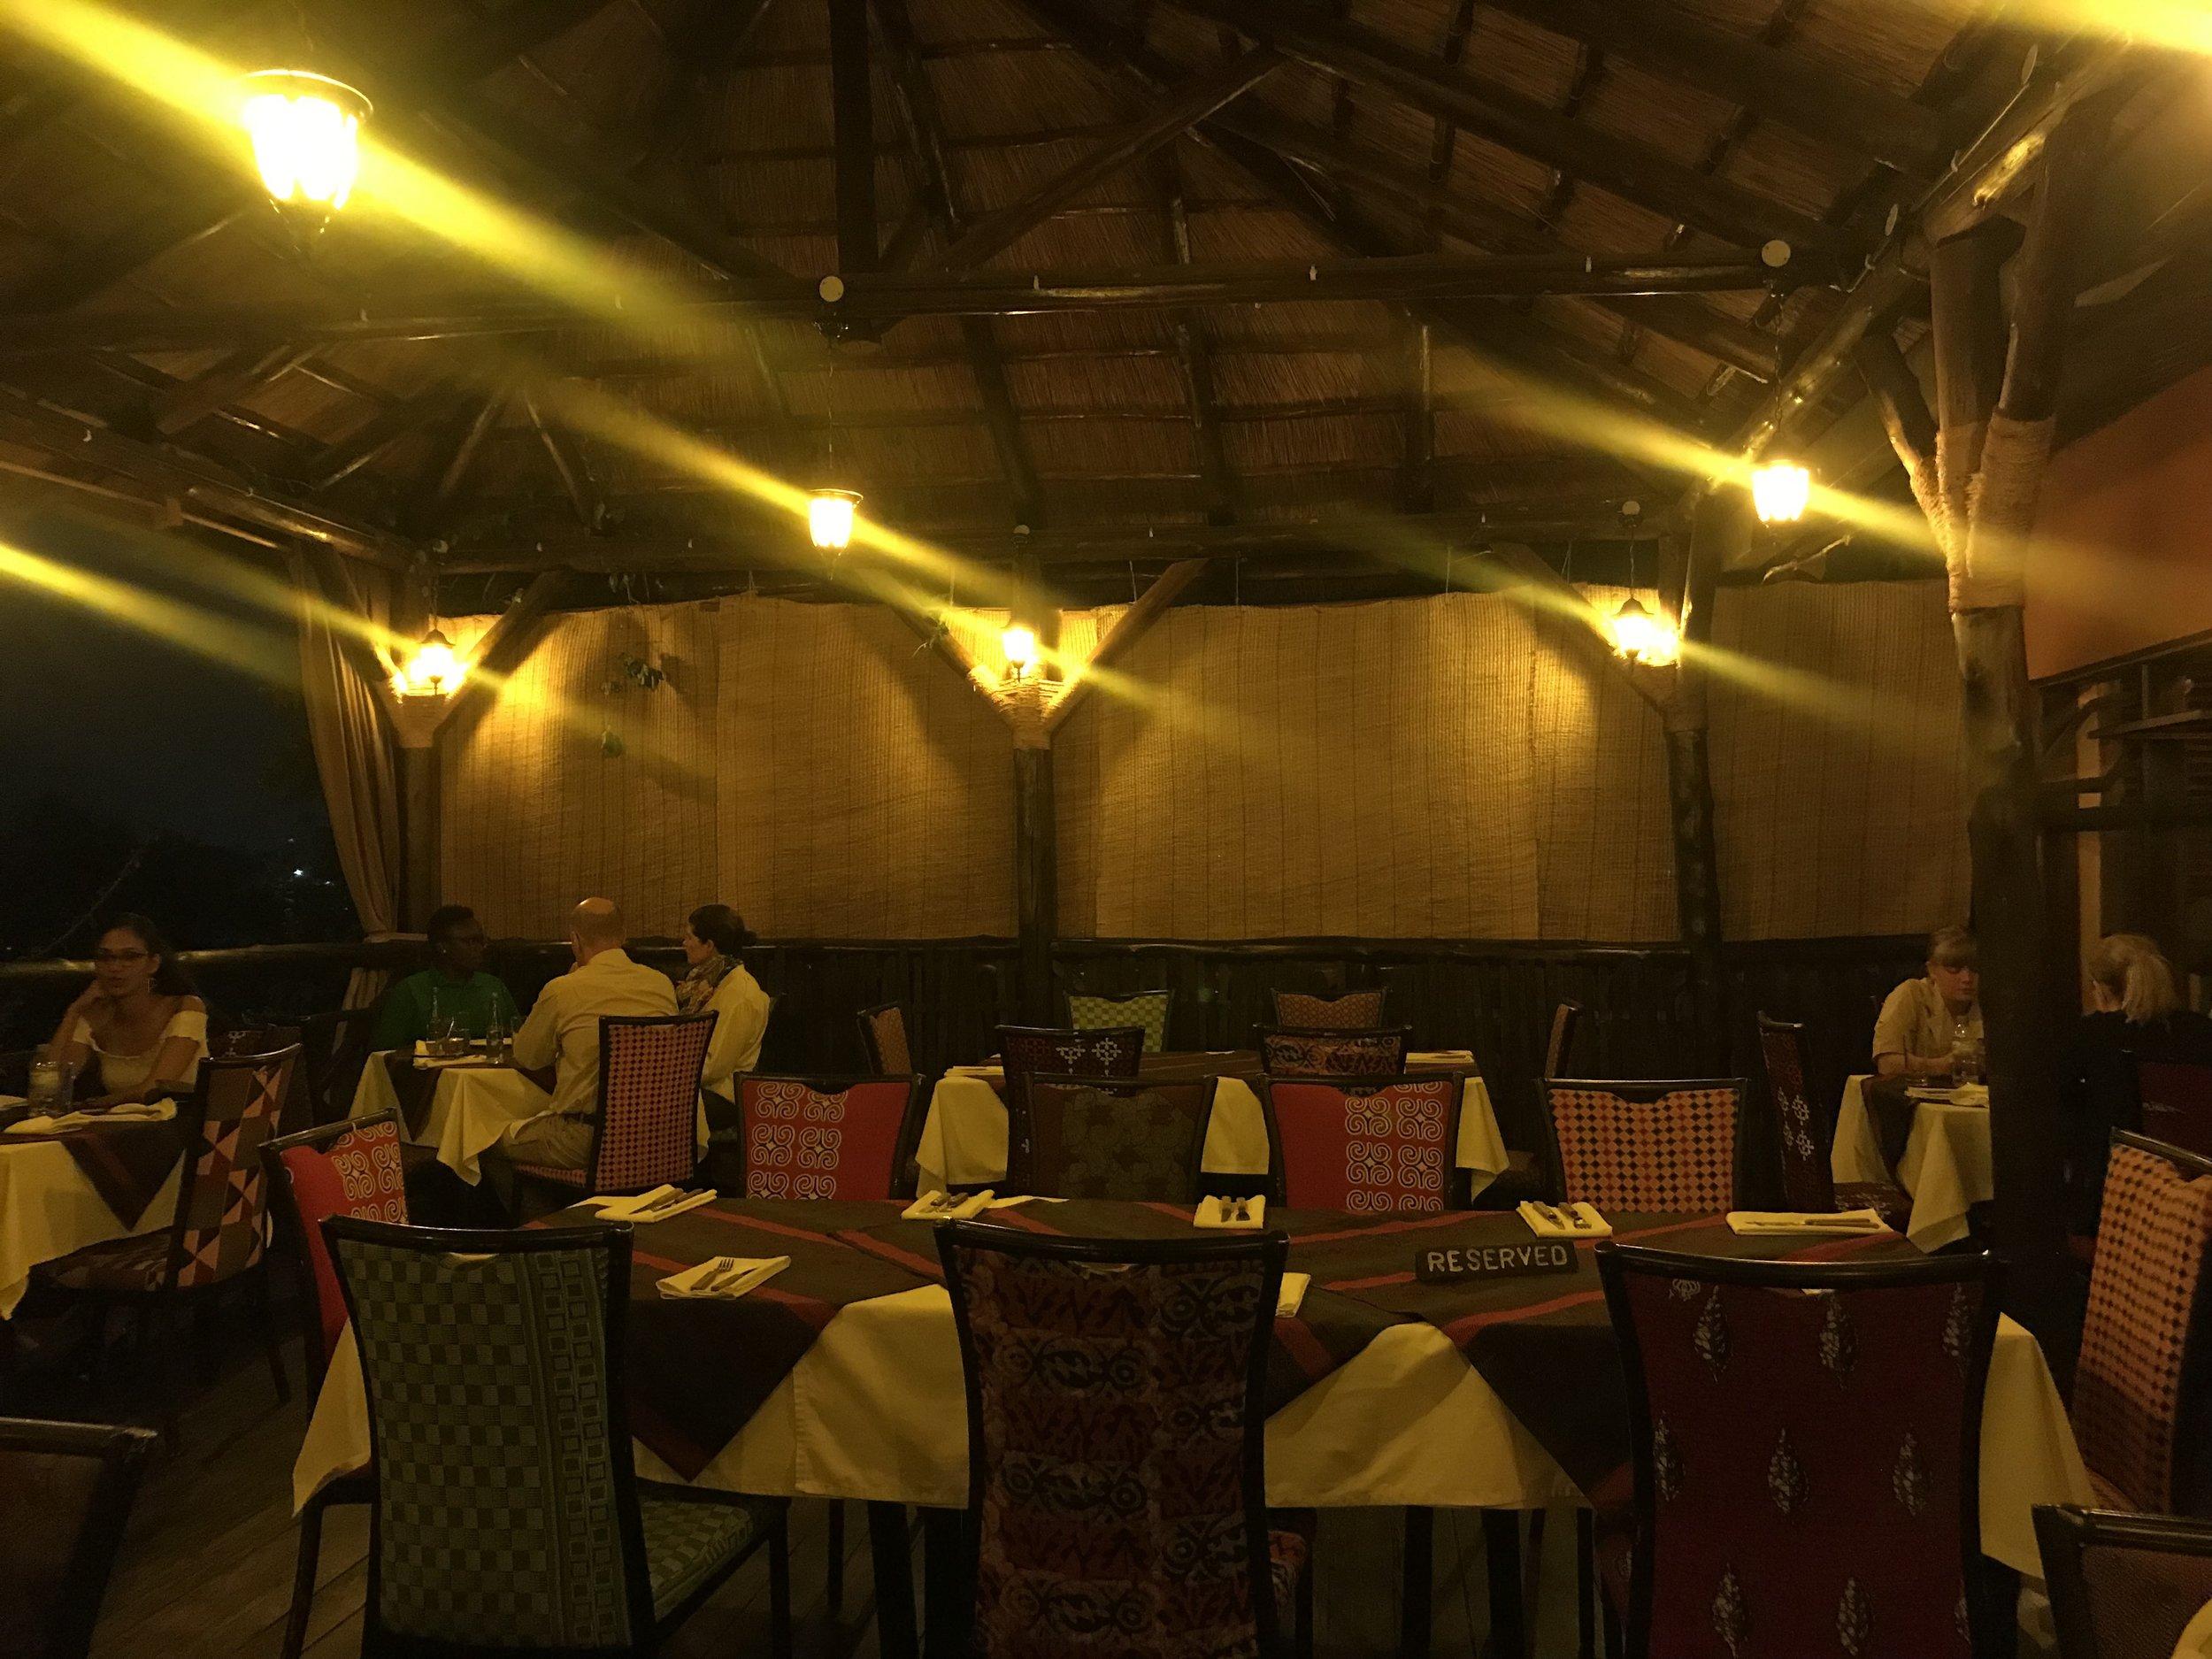 IMG_6236 2VickieRemoe-travel-kigali-rwanda-review-kwibohora25-hotels-africa.JPG